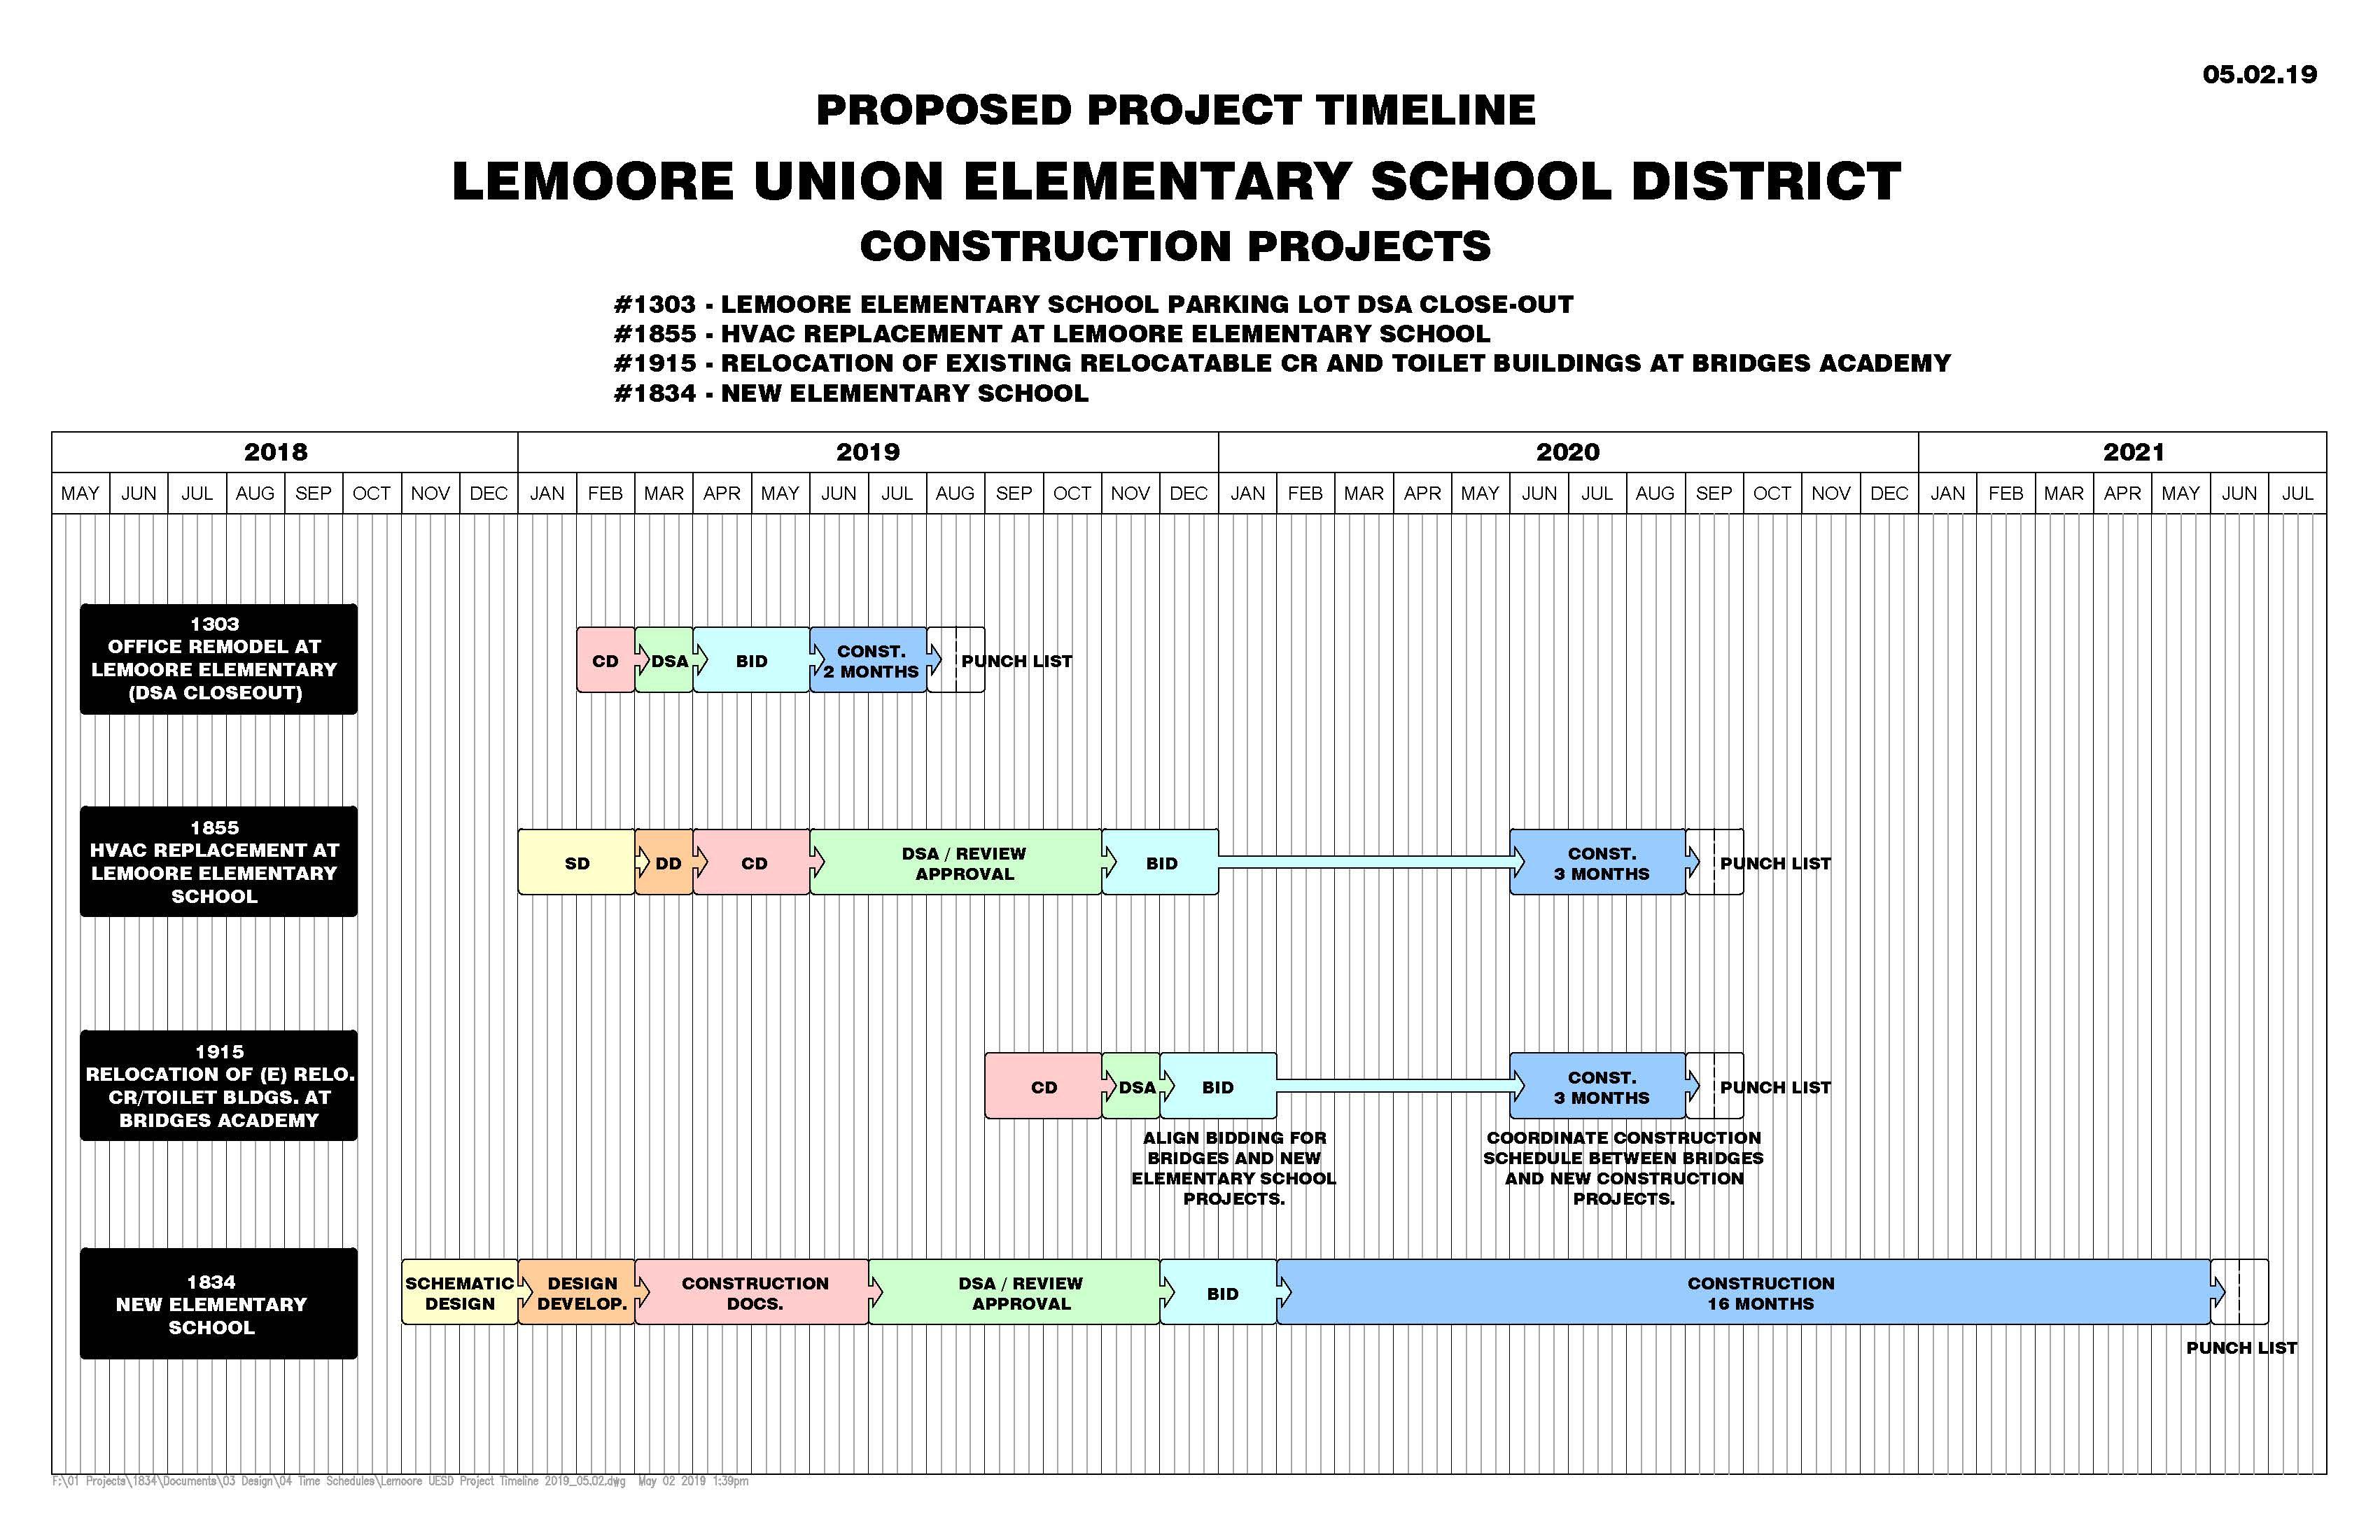 Lemoore Union Elementary School District